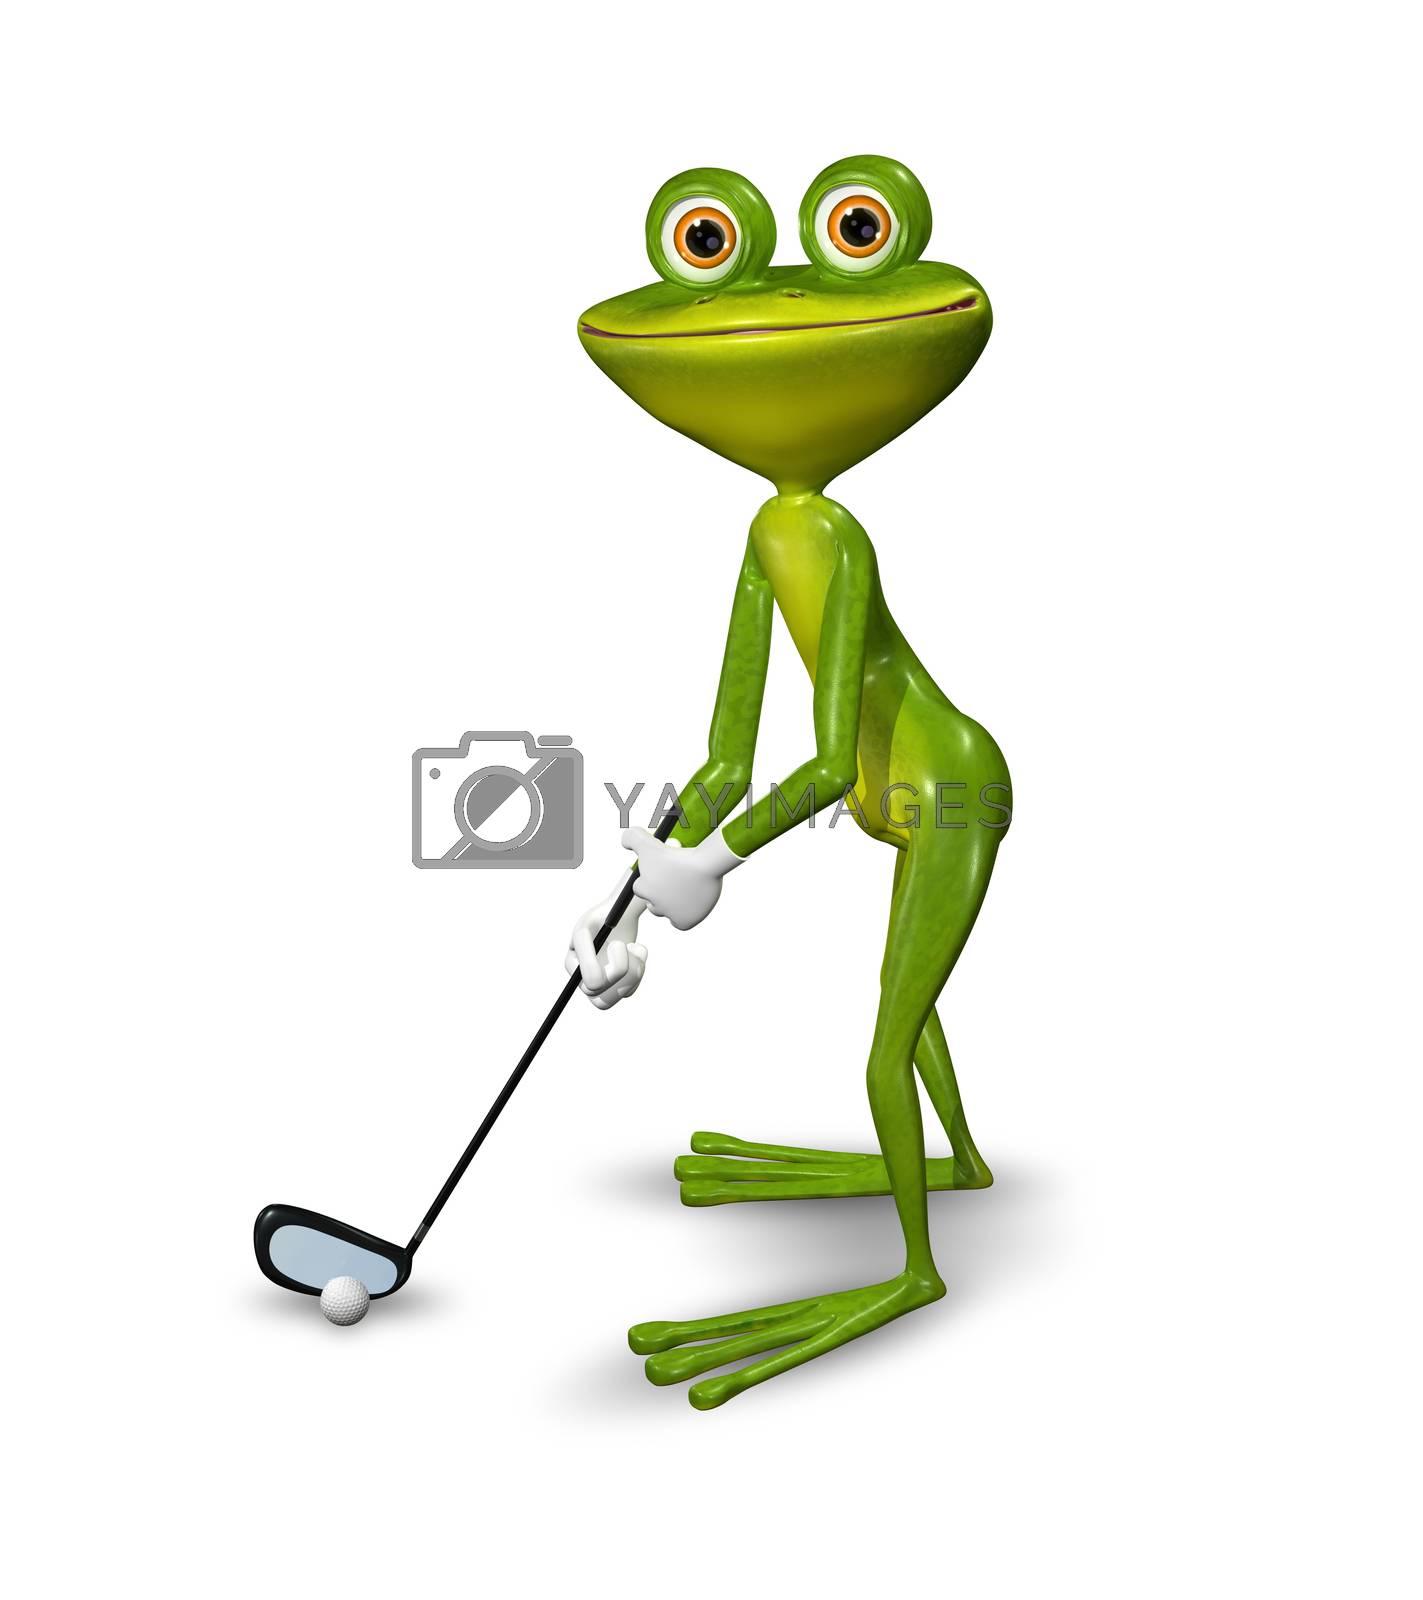 Illustration frog golfer on a white background